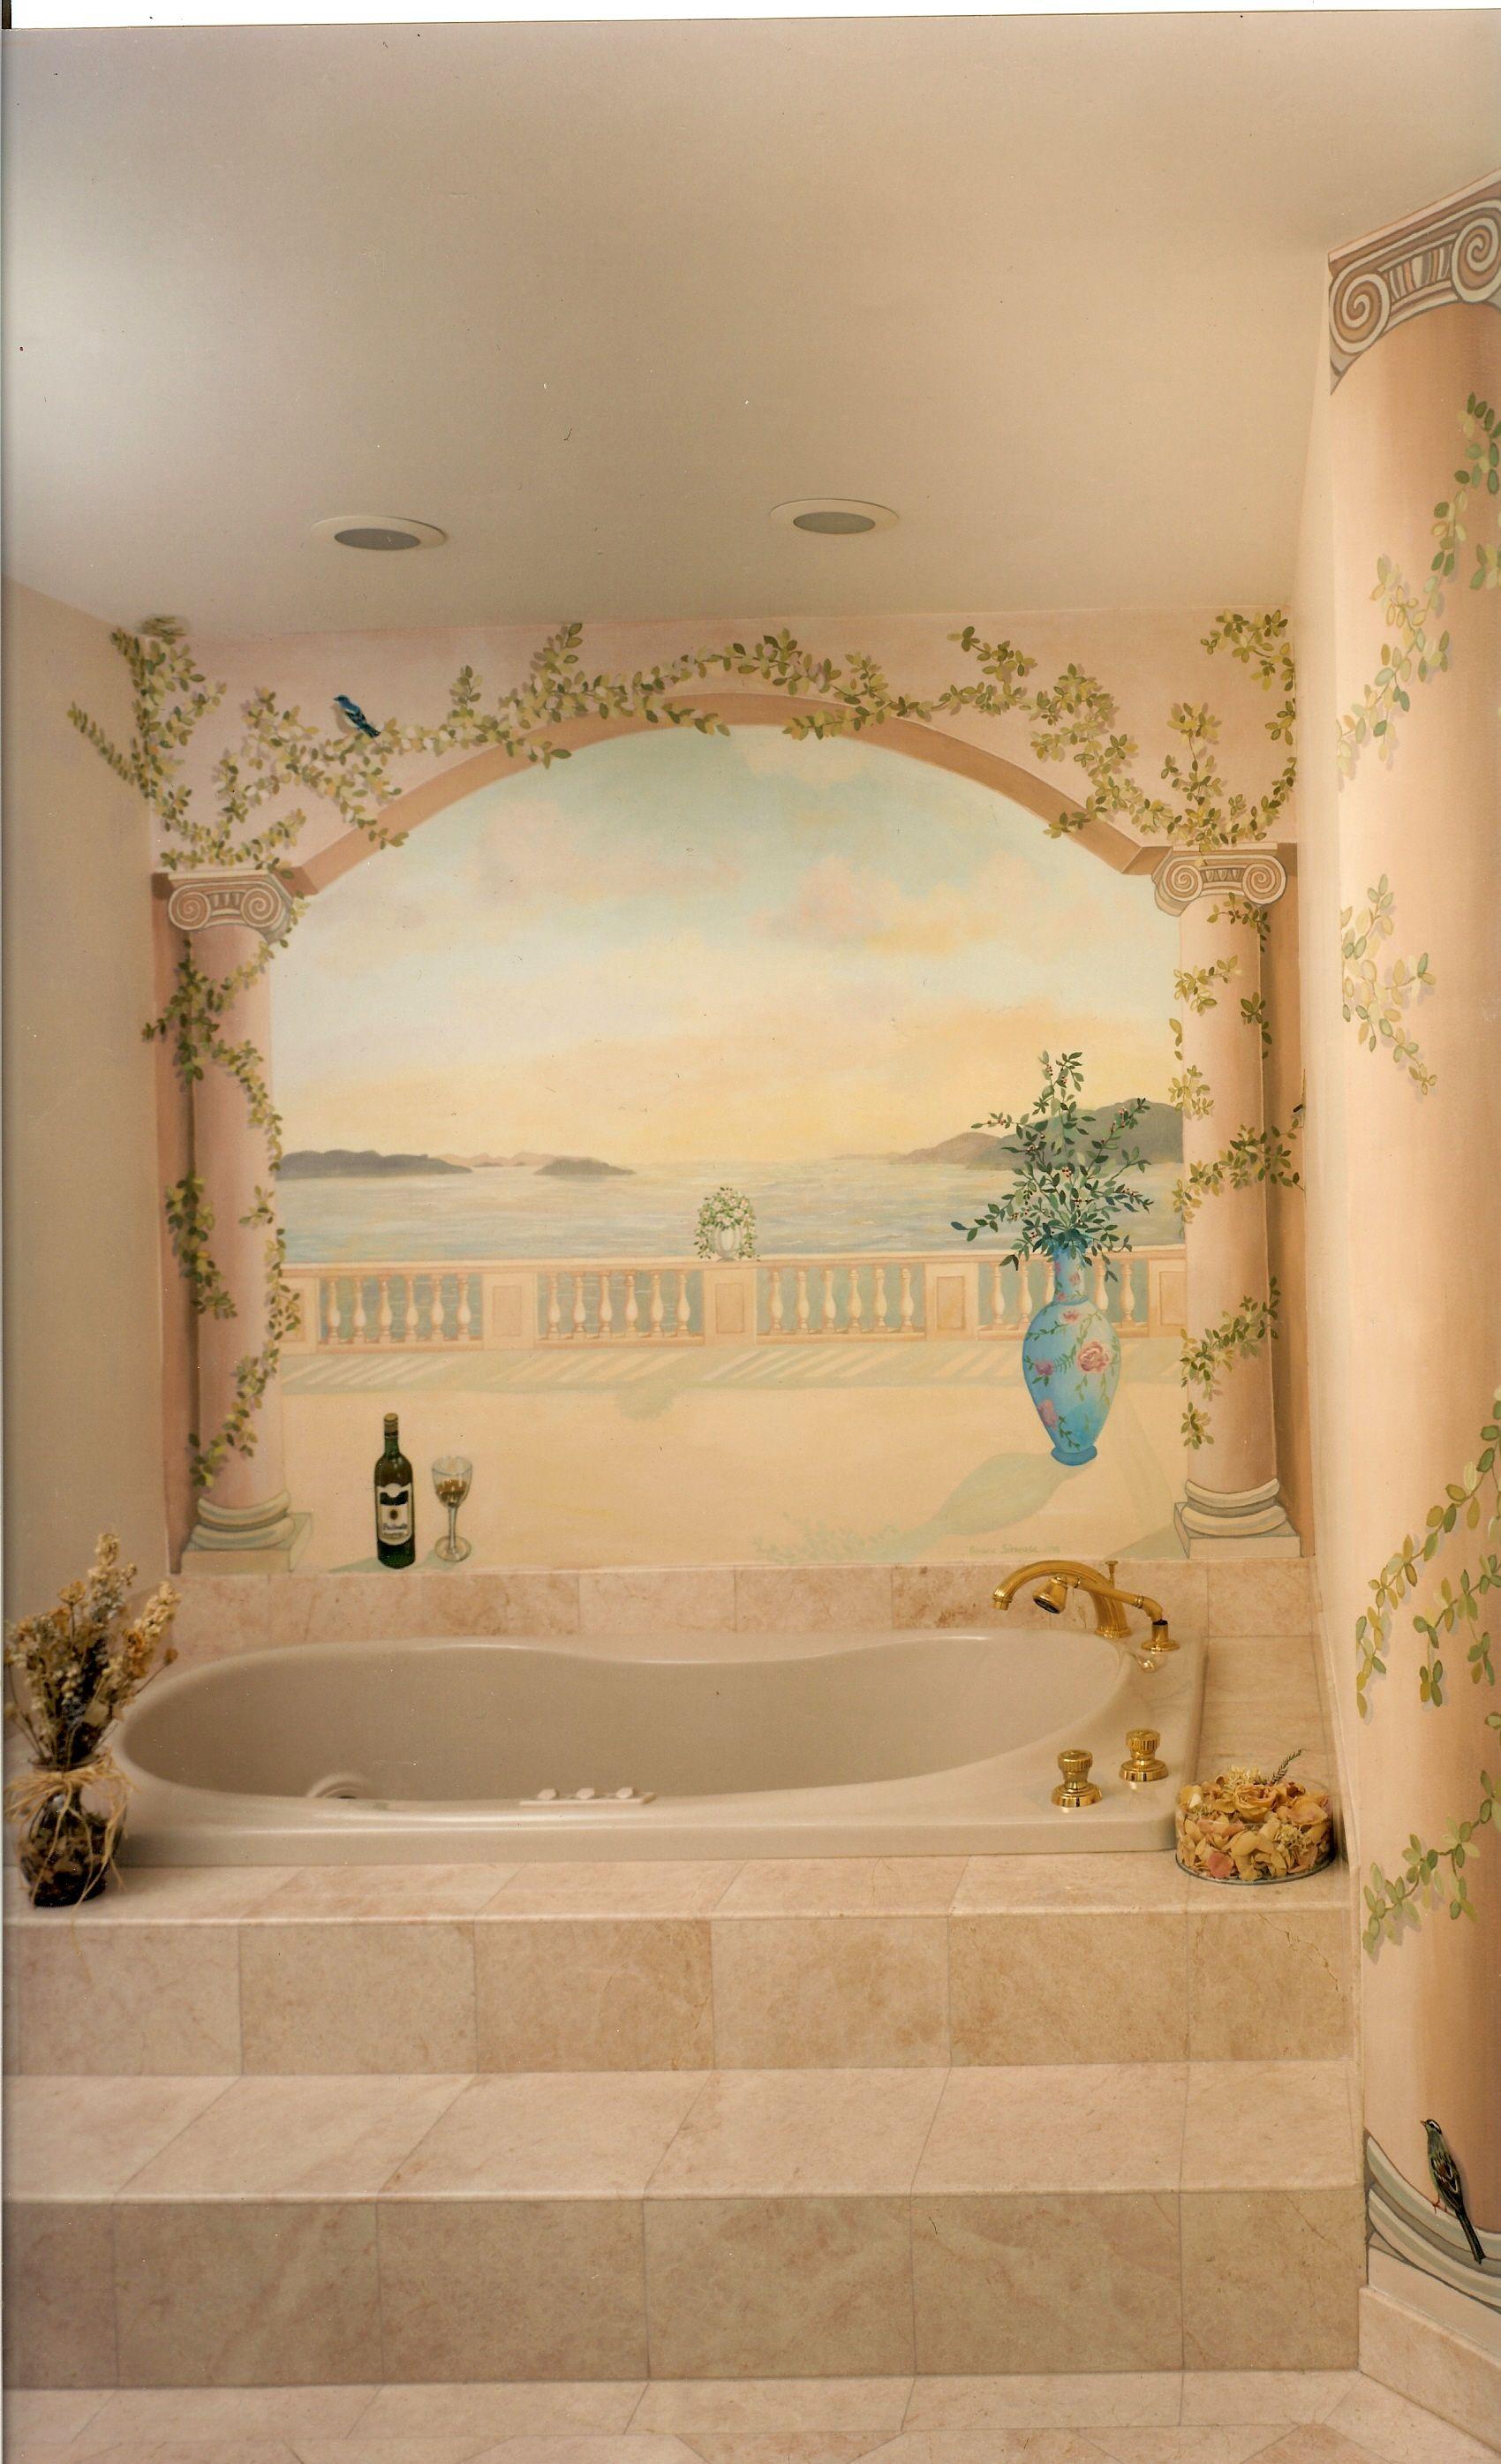 LI-sound-mural-for-master-bath.1.jpg 1,700×2,790 pixels | Murals ...